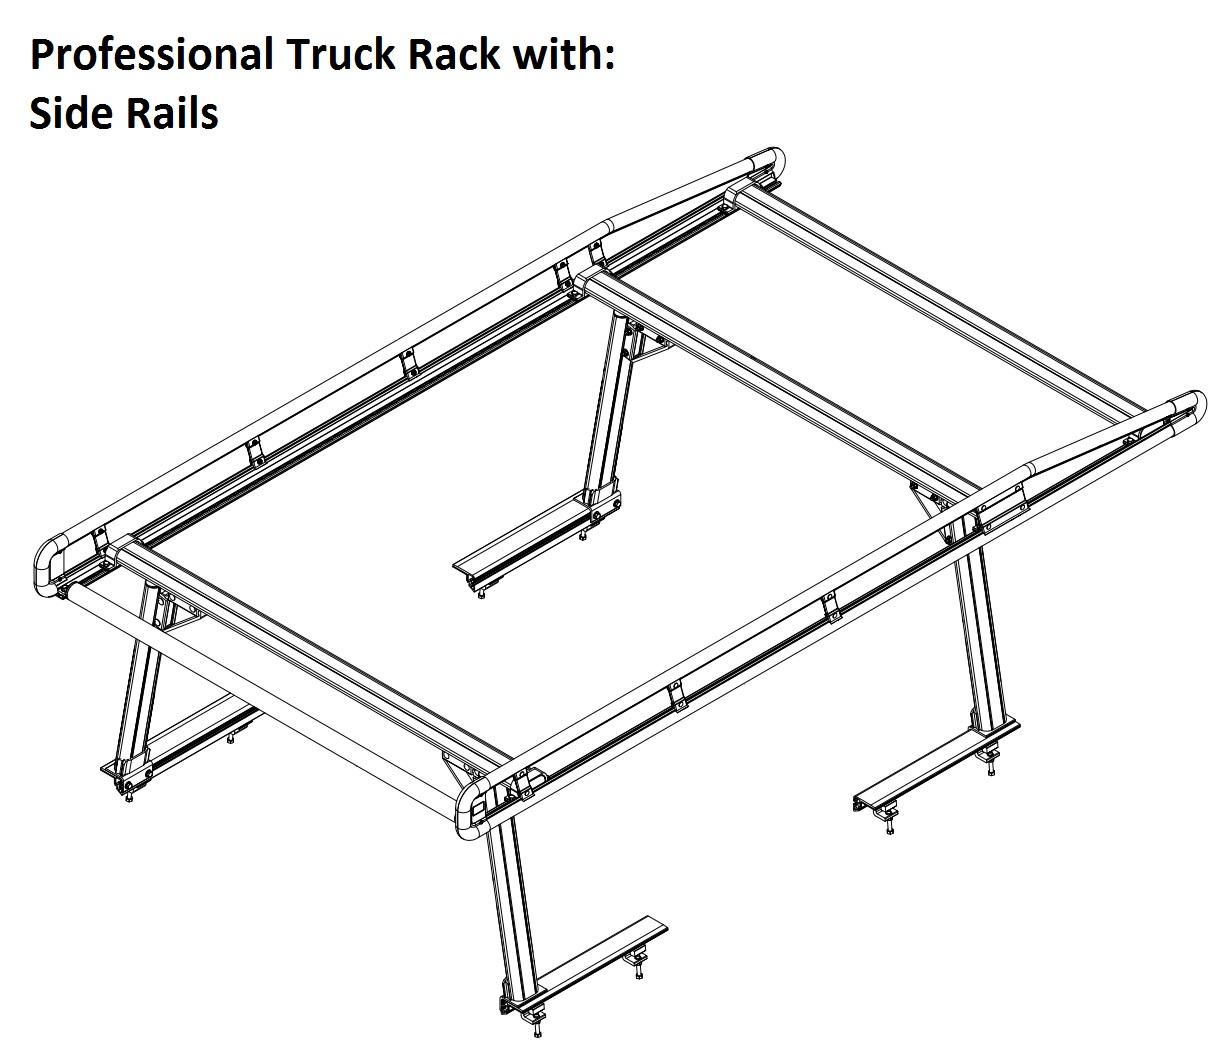 Professional Truck Rack